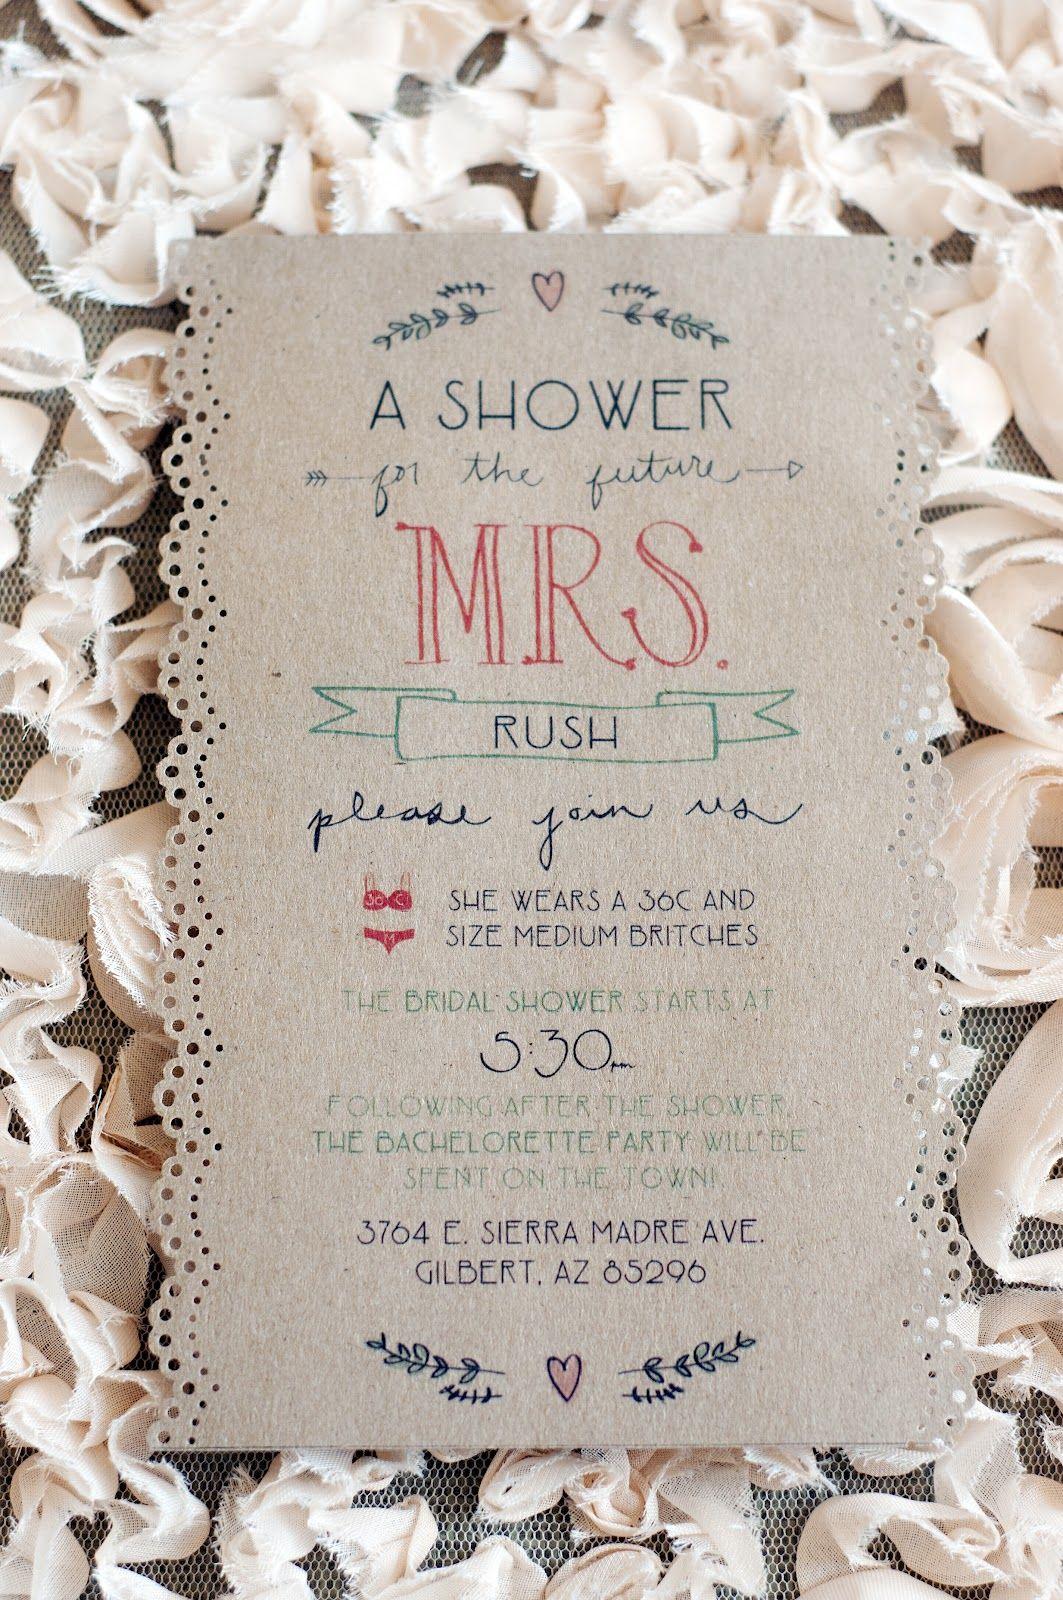 Handmade wedding ideas bridal shower invite call me moh handmade wedding ideas bridal shower invite hens night invitationshomemade solutioingenieria Choice Image